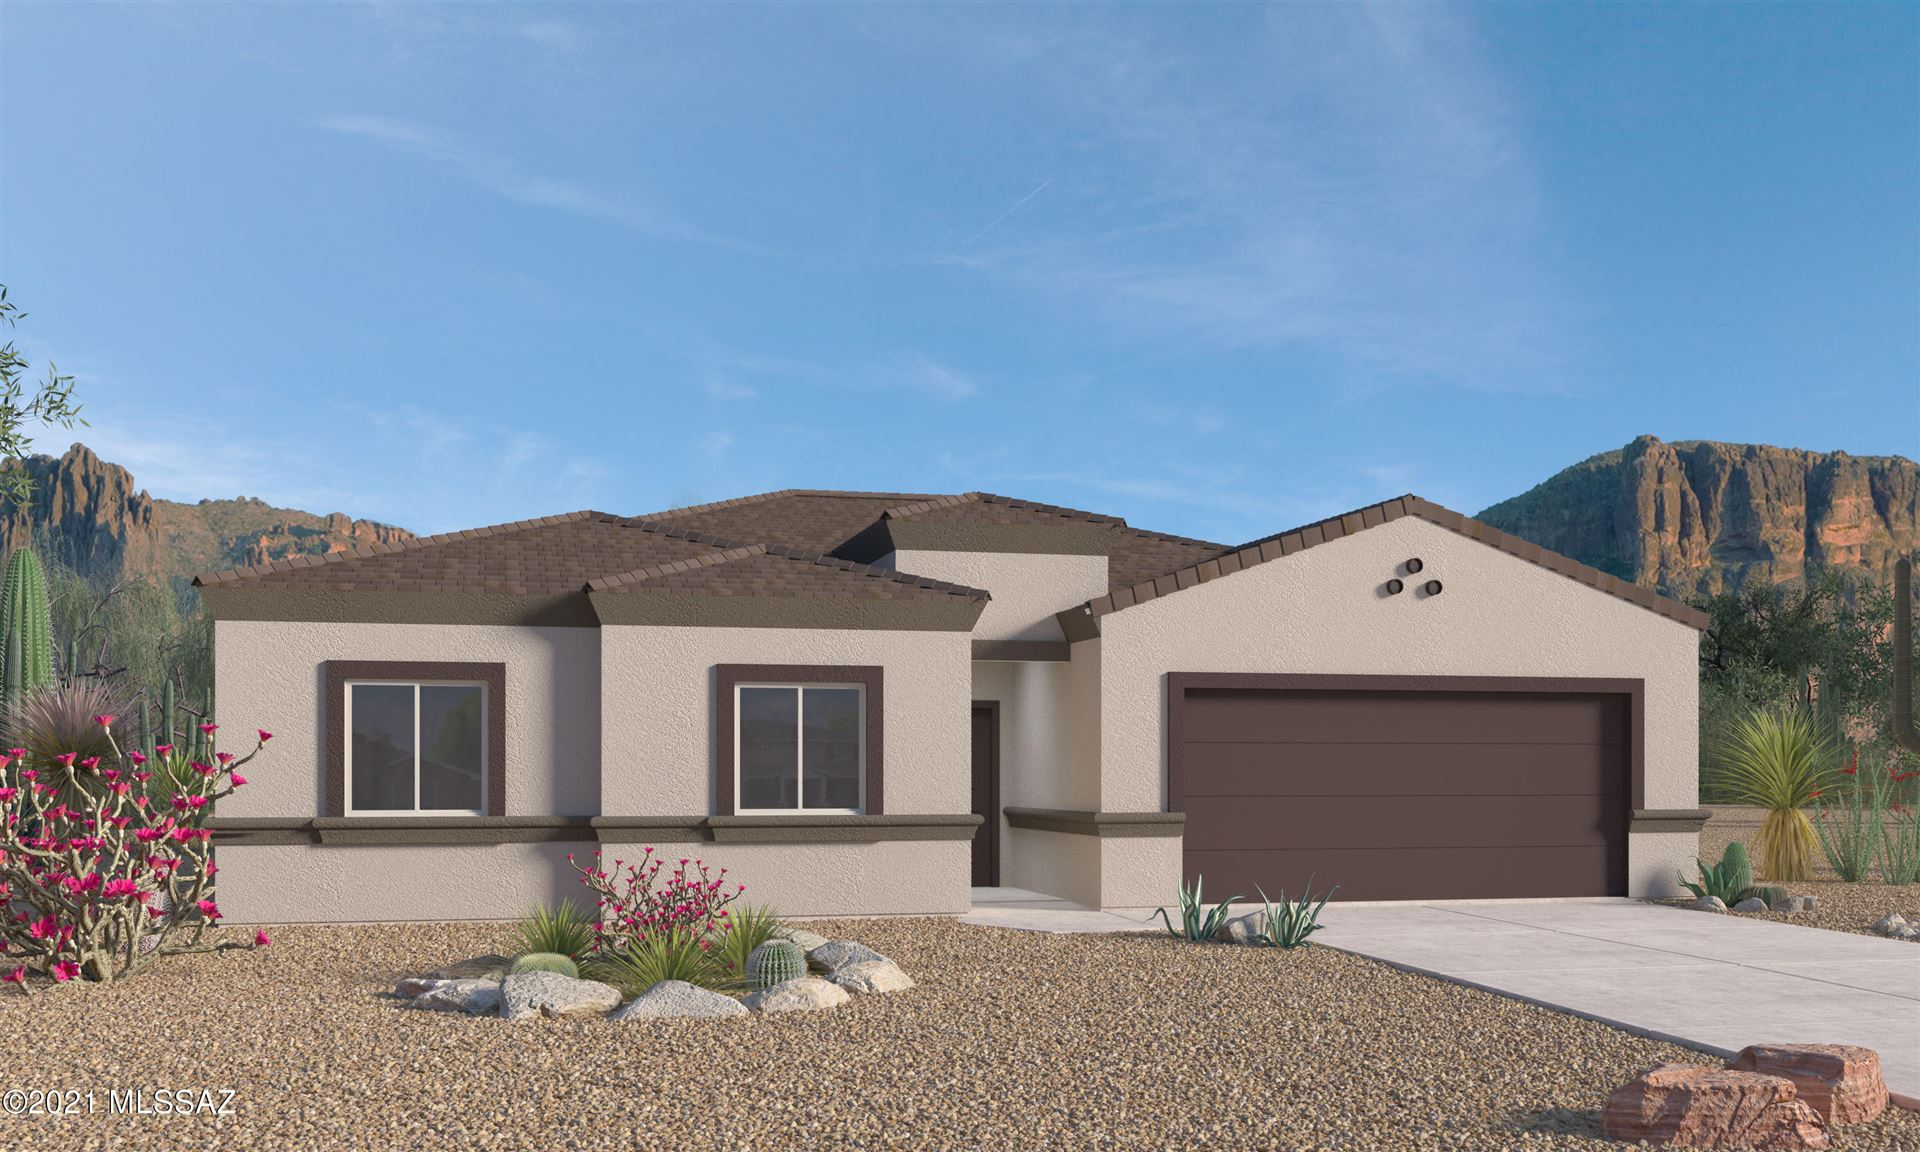 18034 S Silent Lea Lane, Sahuarita, AZ 85629 - MLS#: 22125281